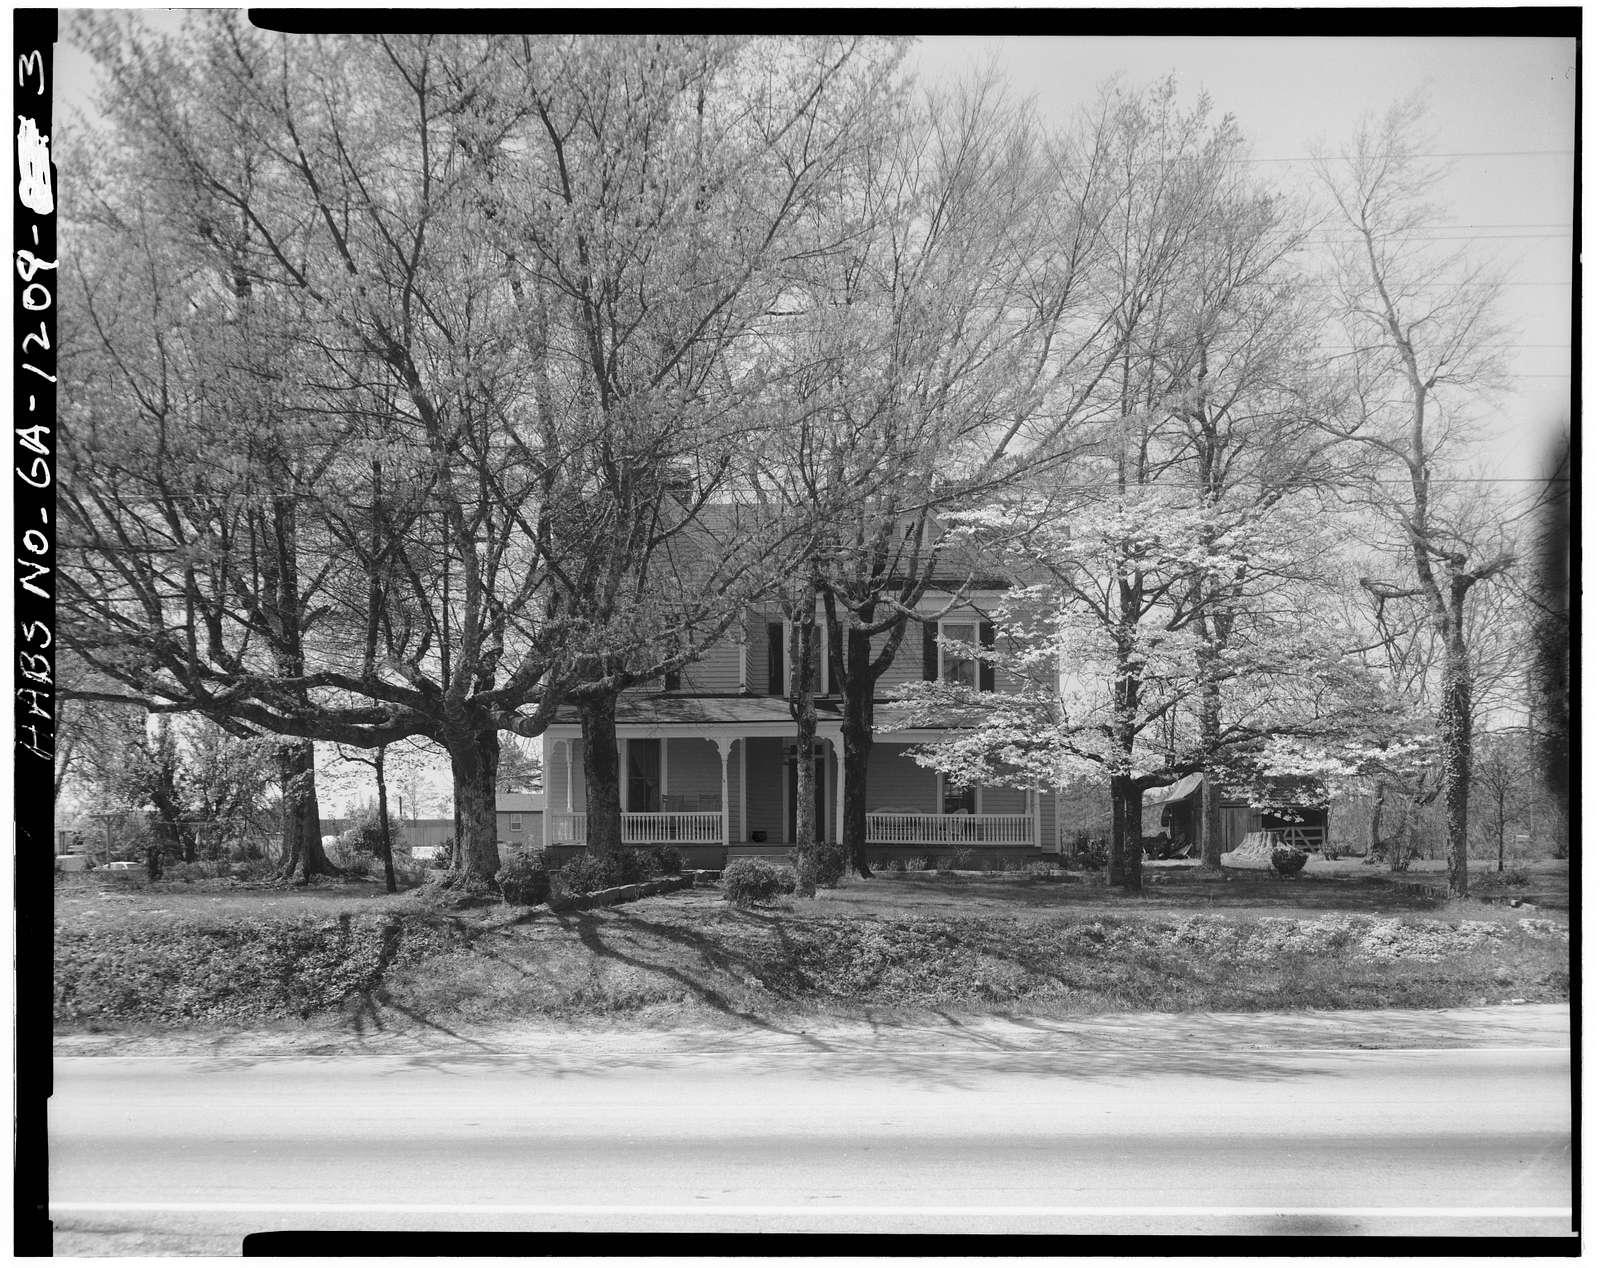 James Berrien Upshaw Homeplace, U.S. Route 78 & County Road 56 (New Hope Church Road), Between, Walton County, GA